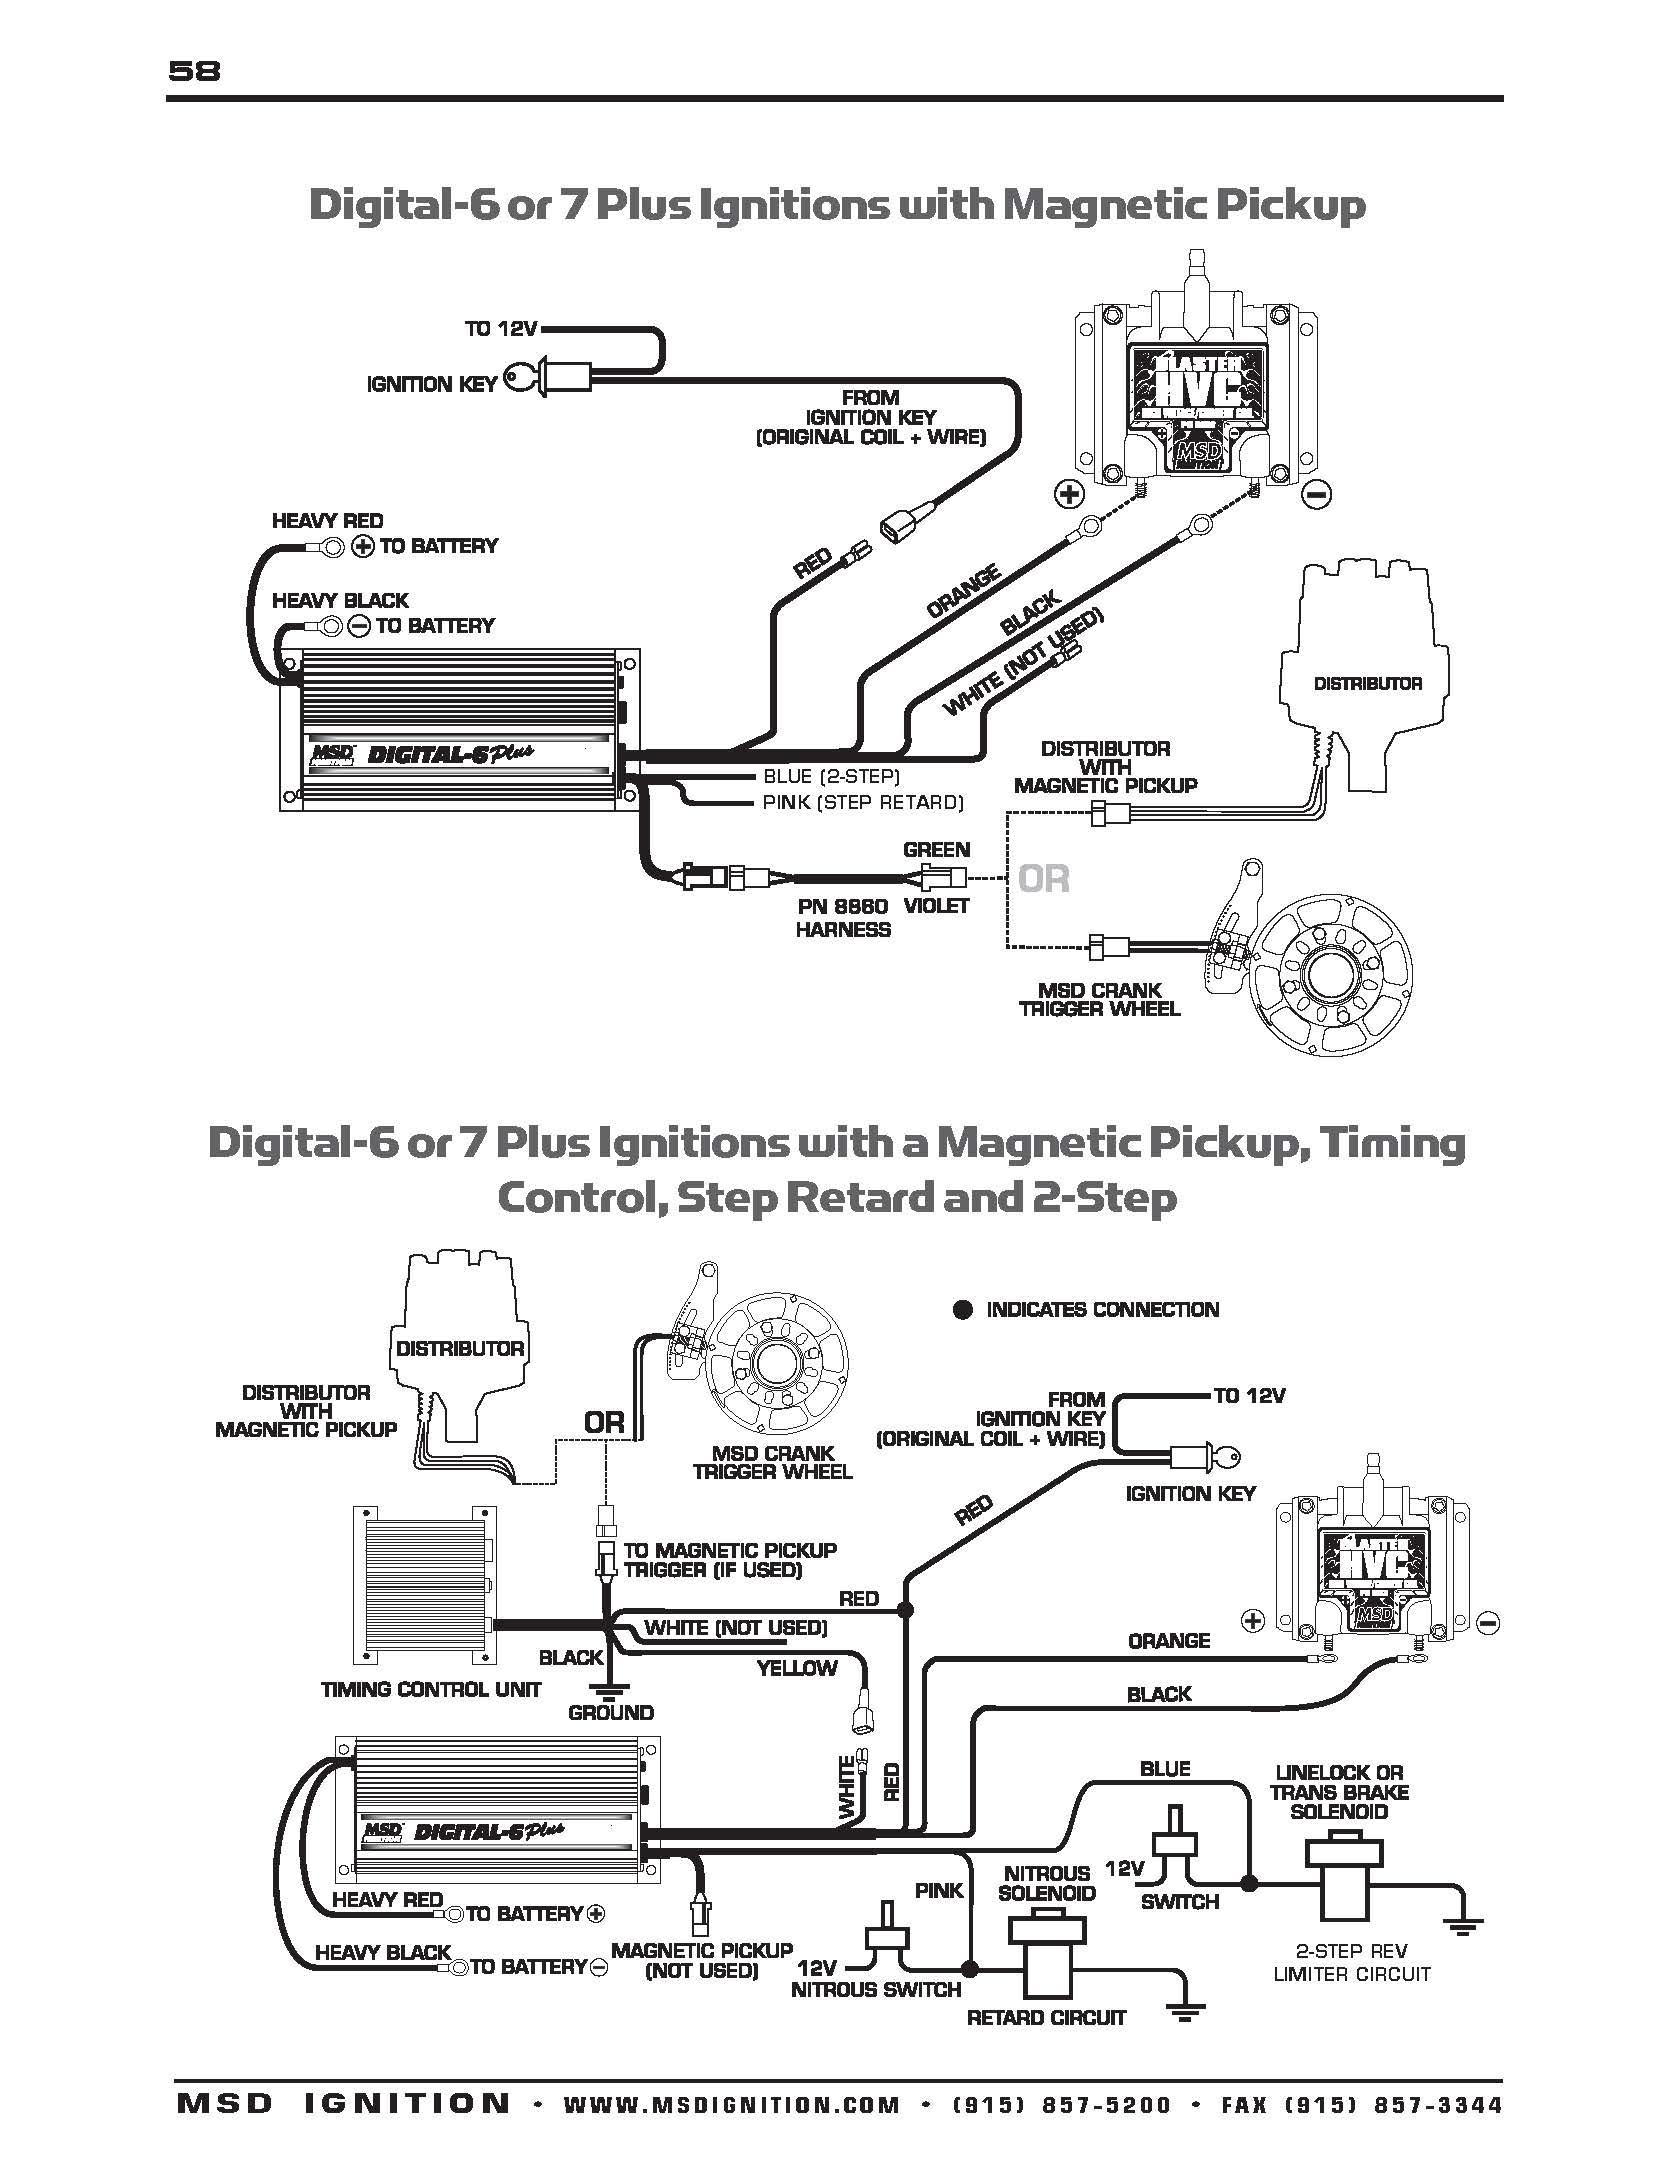 Sensational Ford Msd Wiring Diagram Basic Electronics Wiring Diagram Wiring Cloud Ittabisraaidewilluminateatxorg